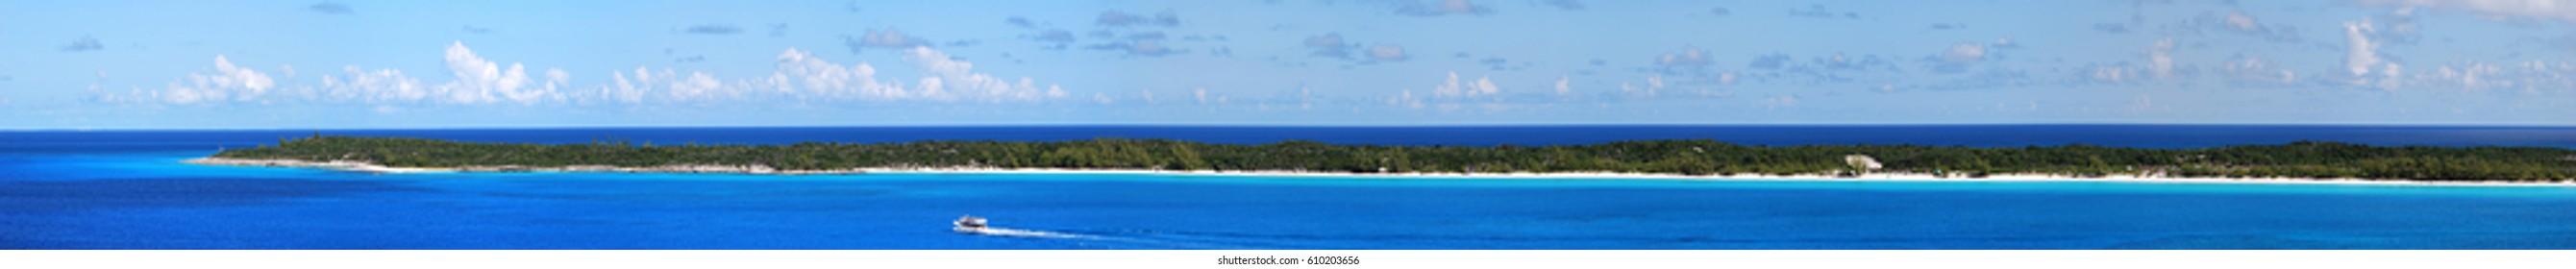 The panoramic view of uninhabited island Half Moon Cay (Bahamas).